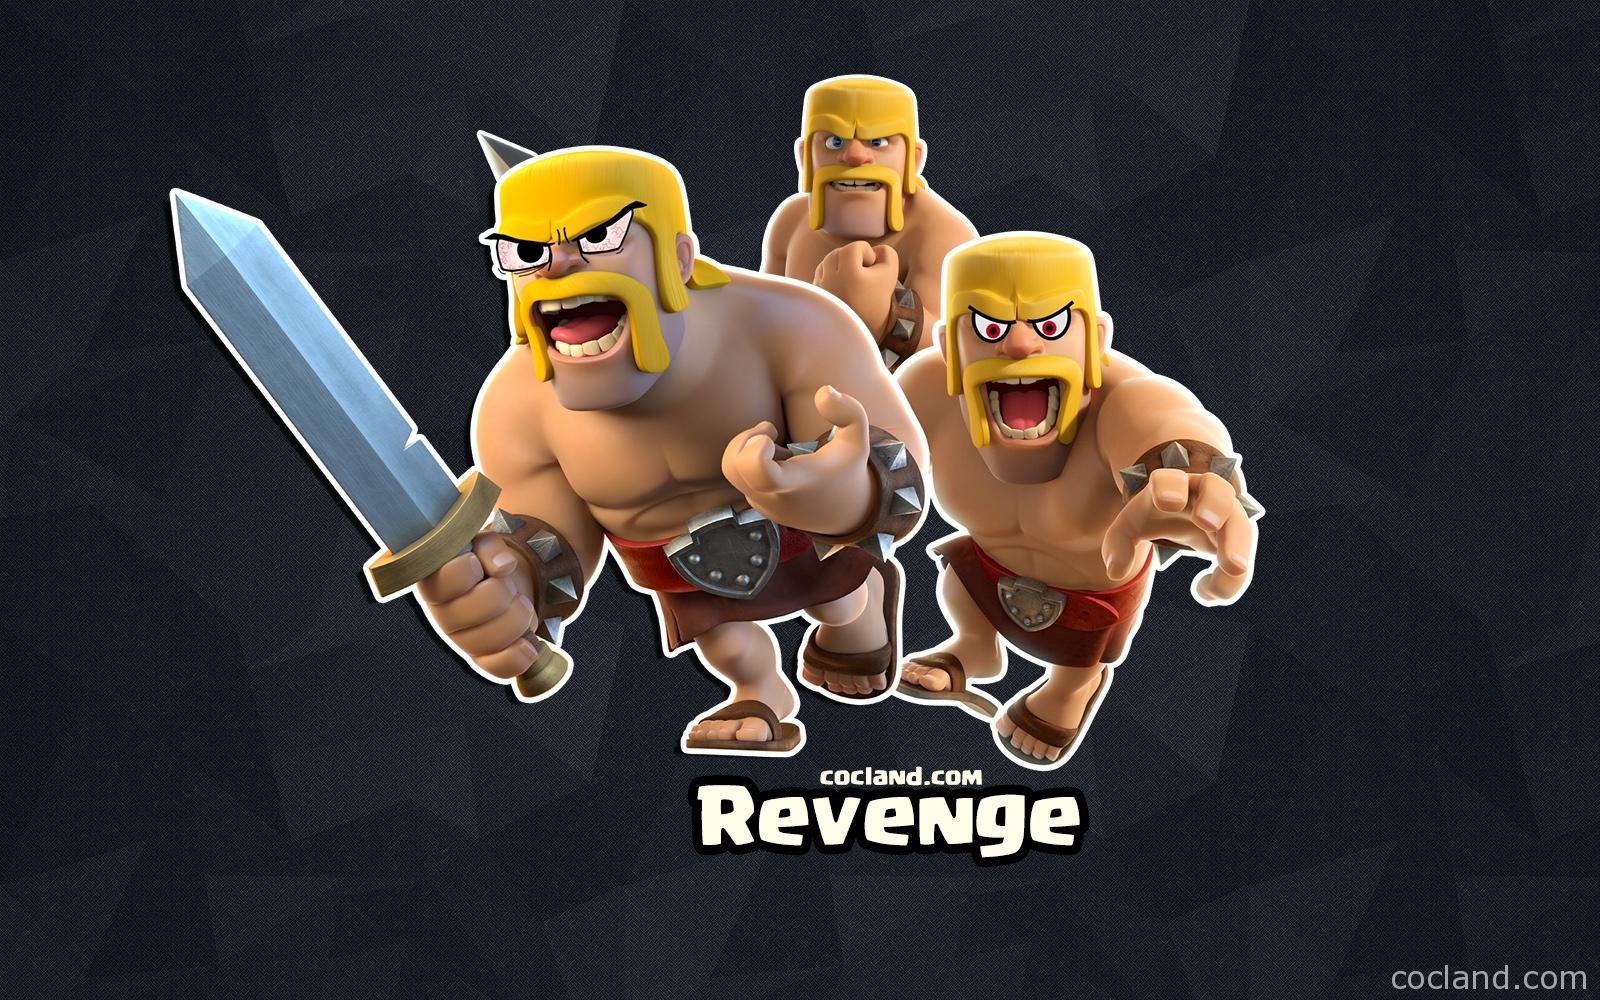 Clash of Clans Revenge Guide